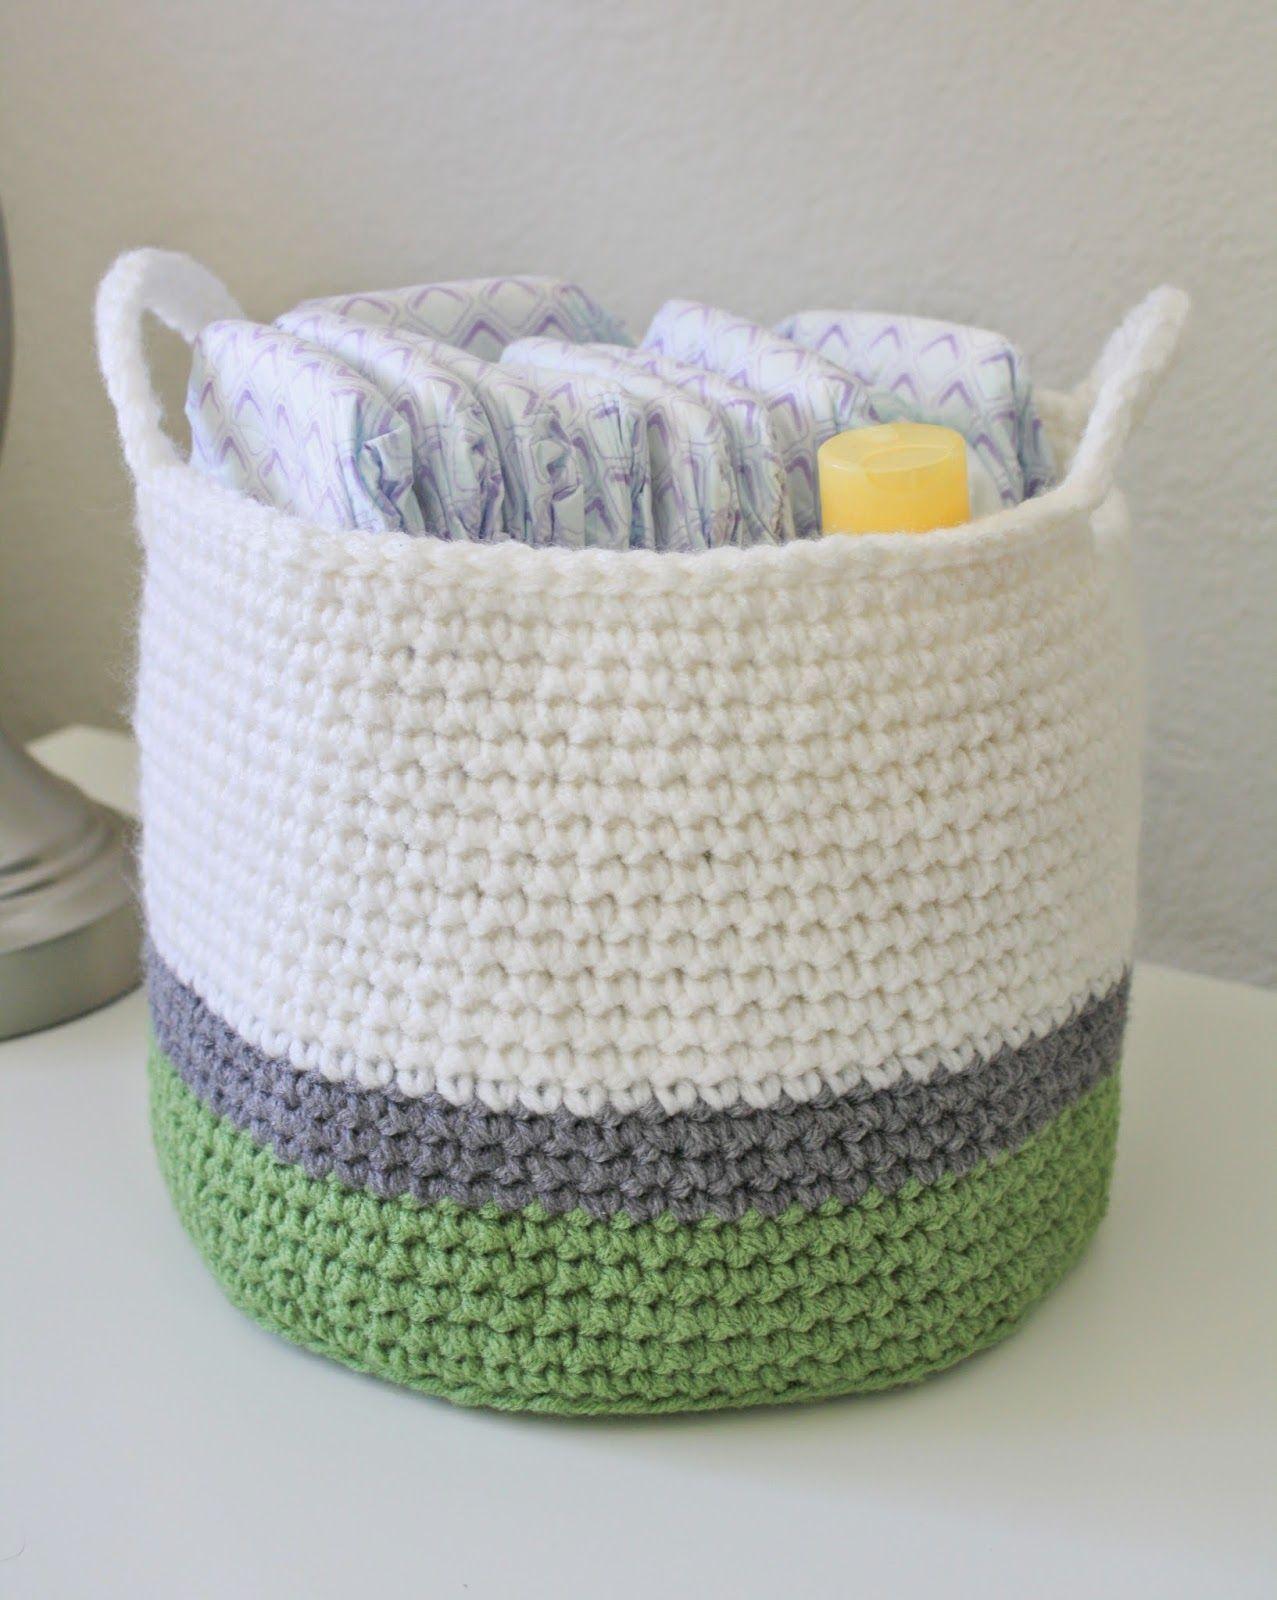 Hermosa Redheart Patrones De Crochet Libre Regalo - Coser Ideas Para ...